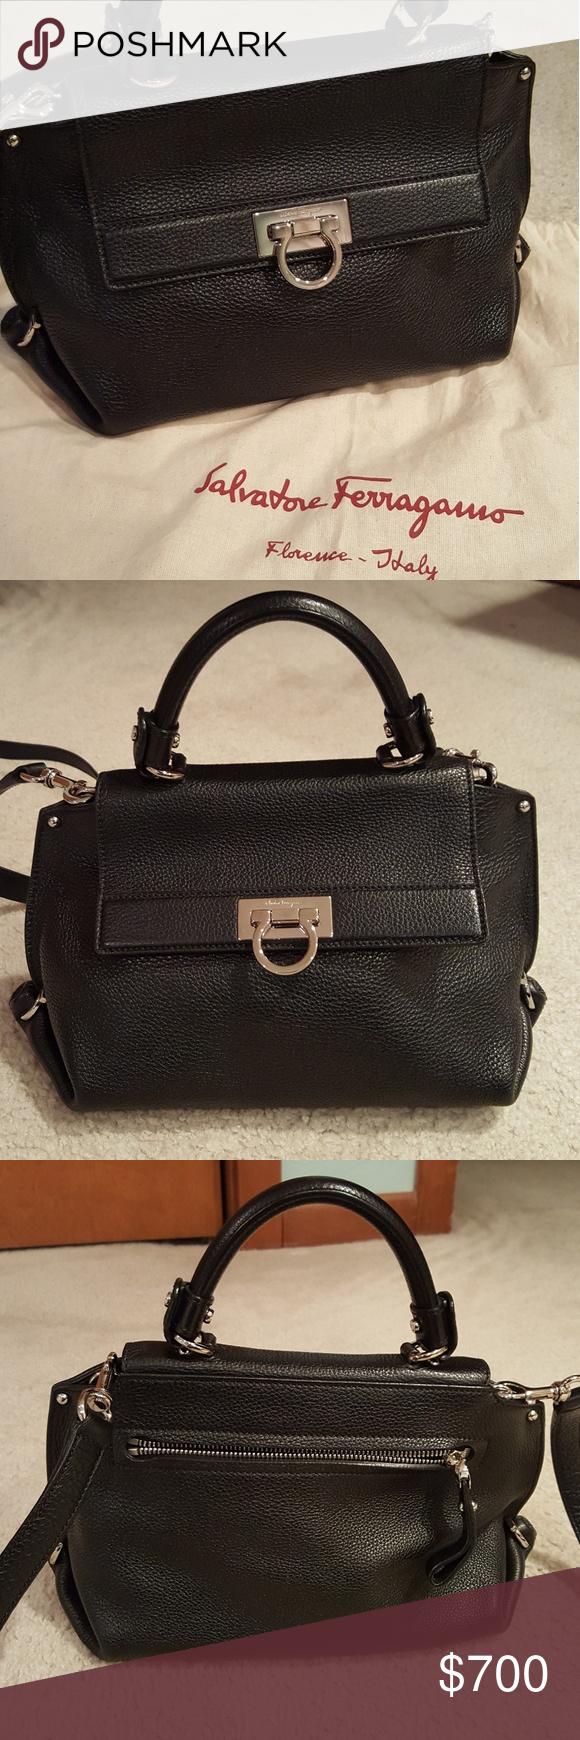 42ed3540b7 Salvatore Ferragamo Small Black Sofia Bag Gently used   in excellent  condition. Stored in original